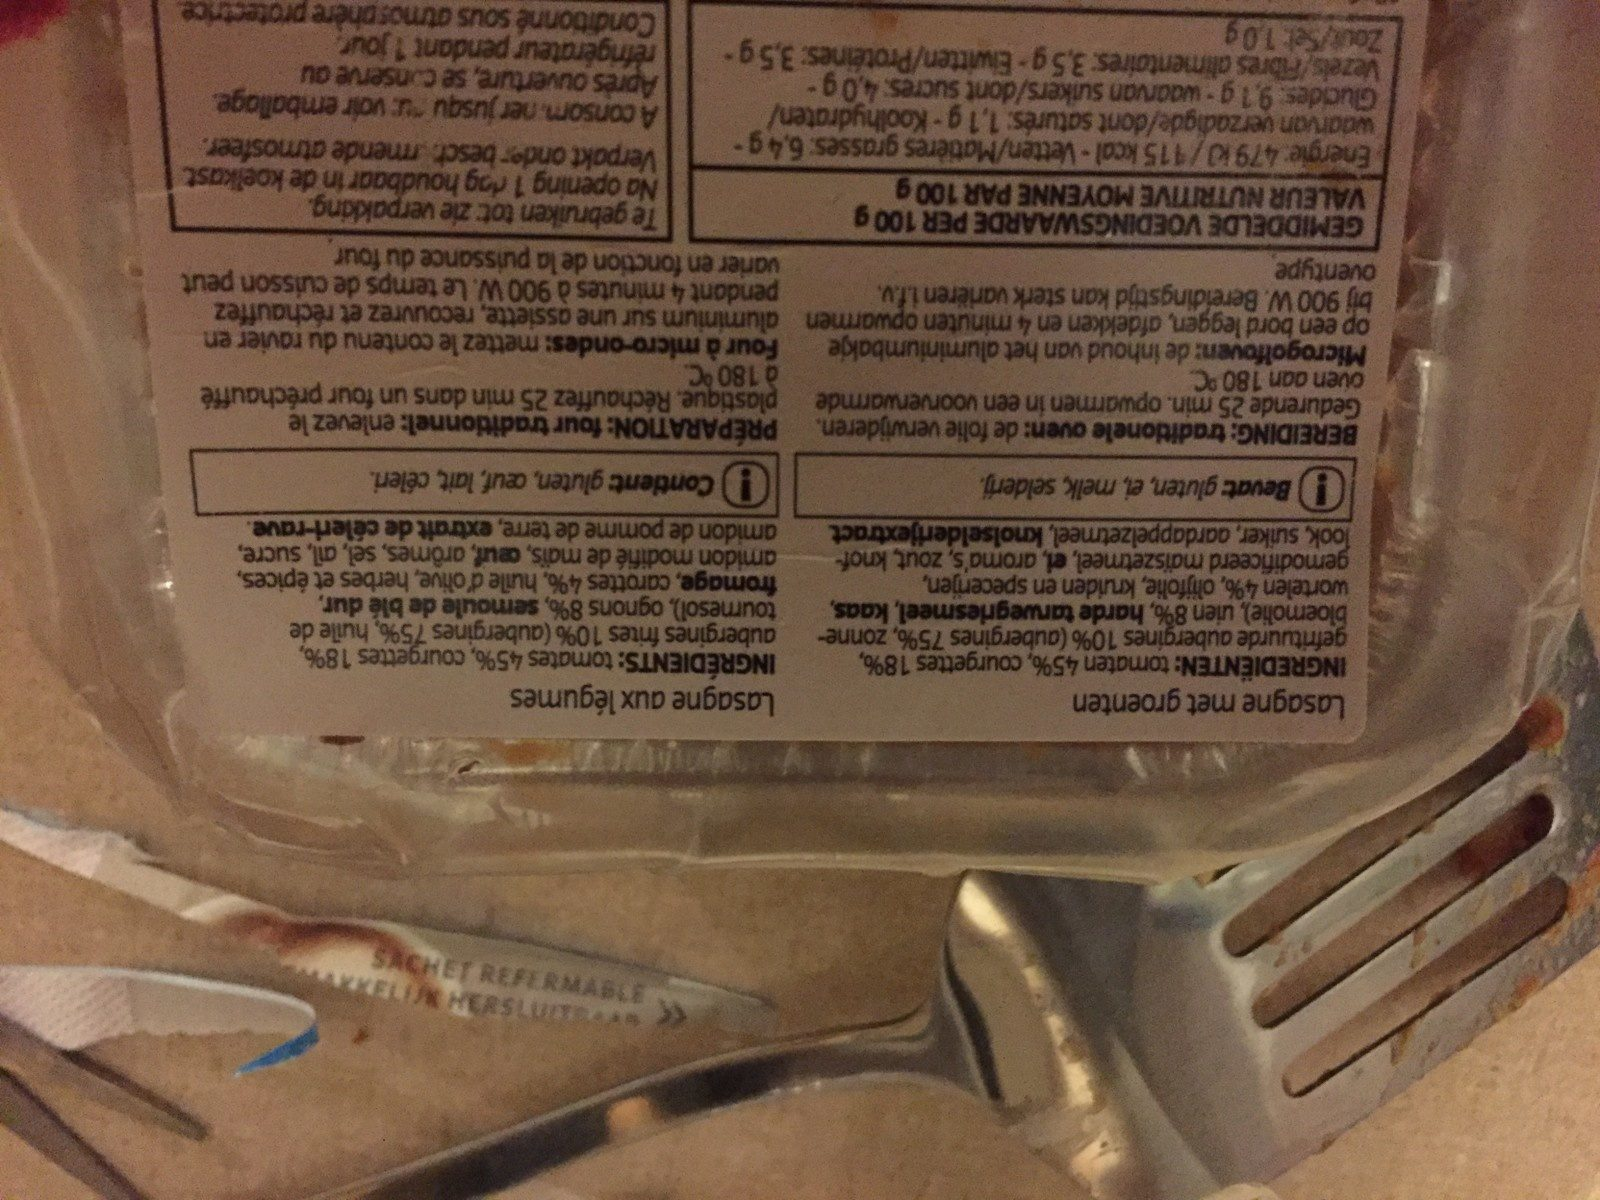 Lasagne aux légumes - Ingrediënten - fr